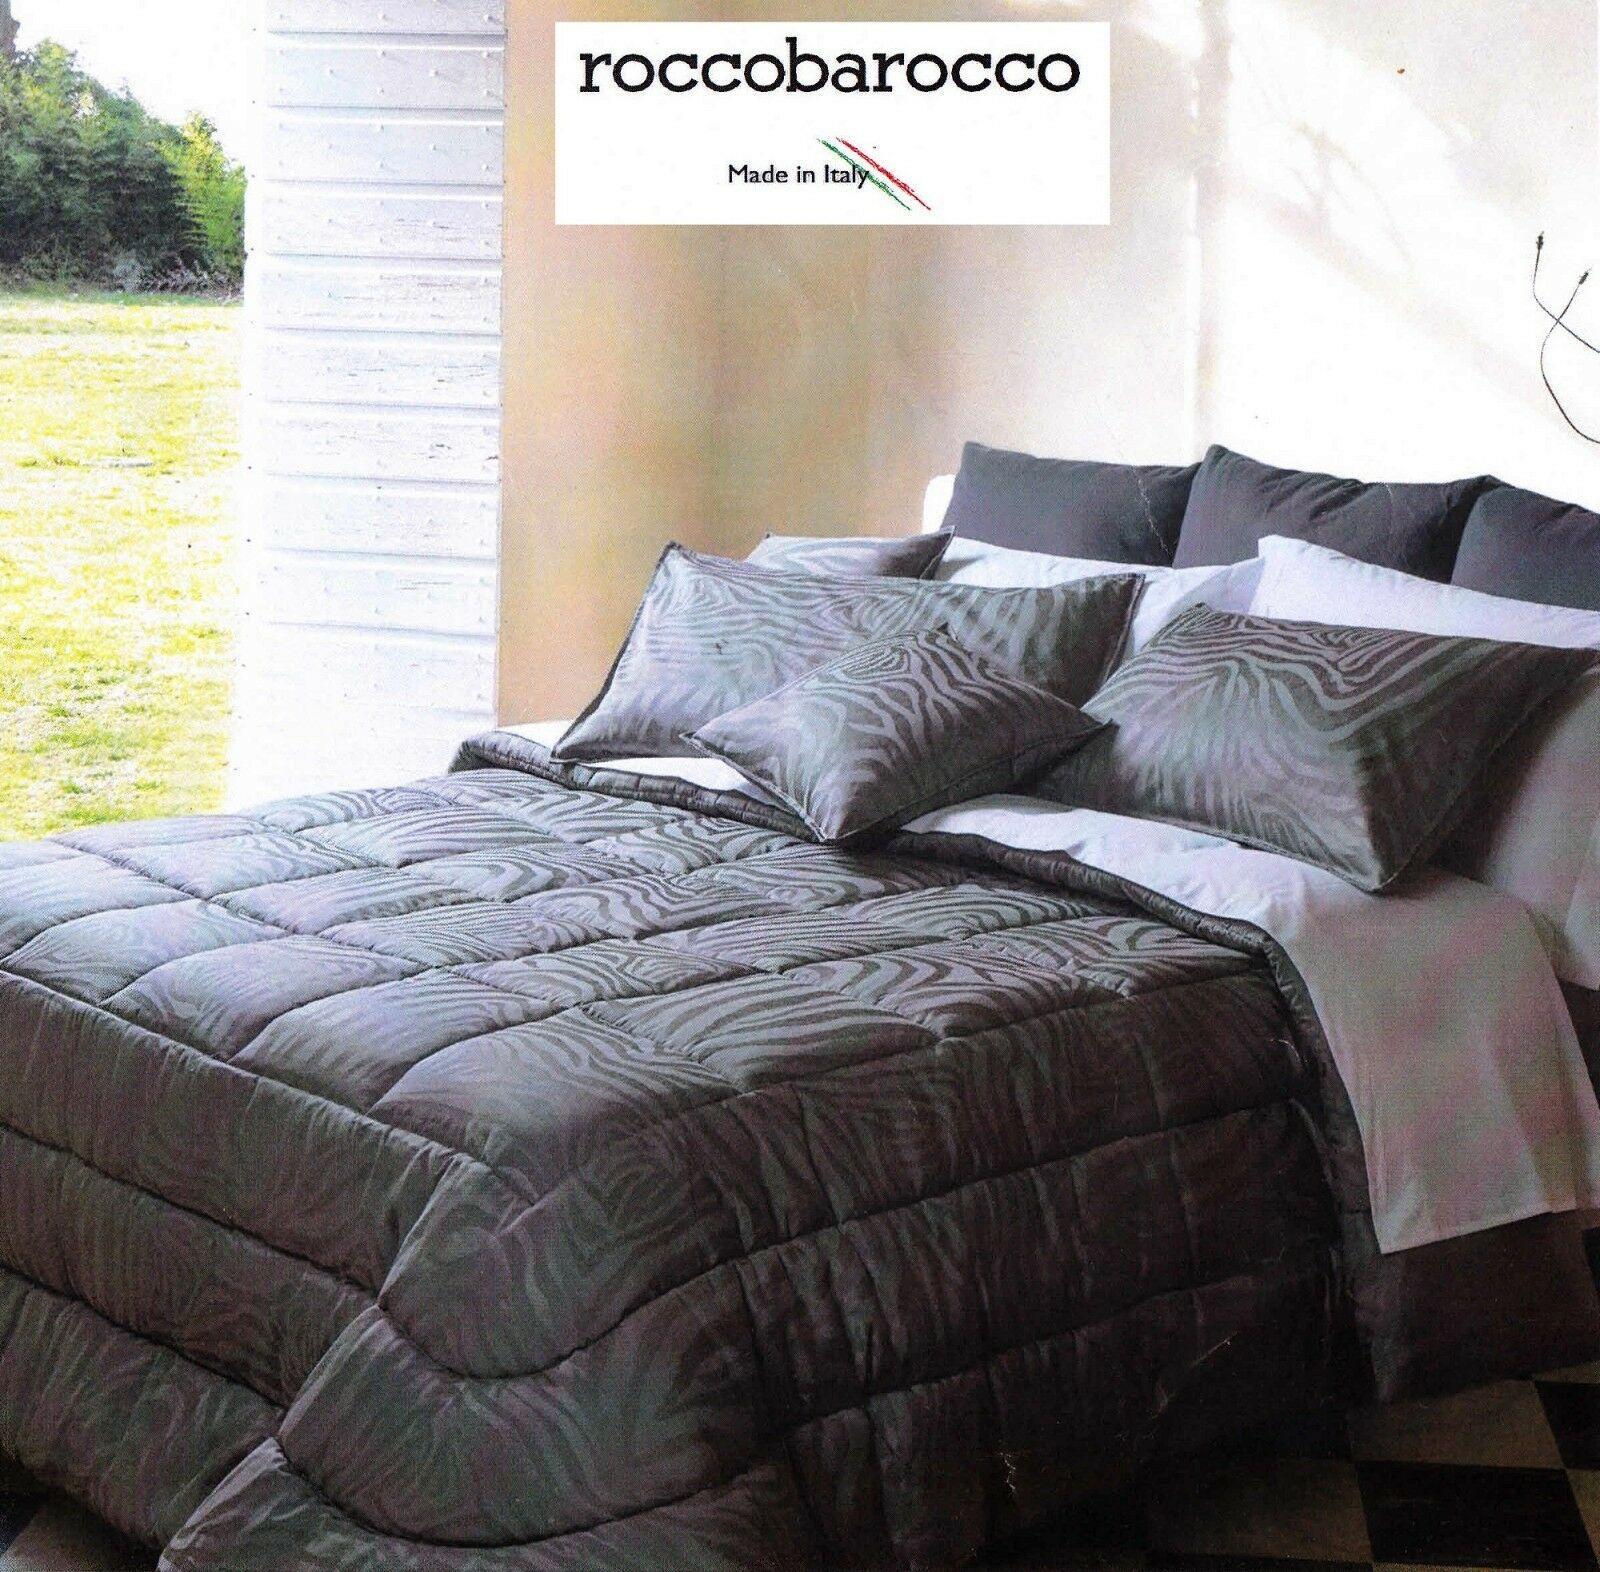 ROCCOBAROCCO, KARIBU'. Copriletto Trapuntato, Jacquard. Matrimoniale, 2 piazze.